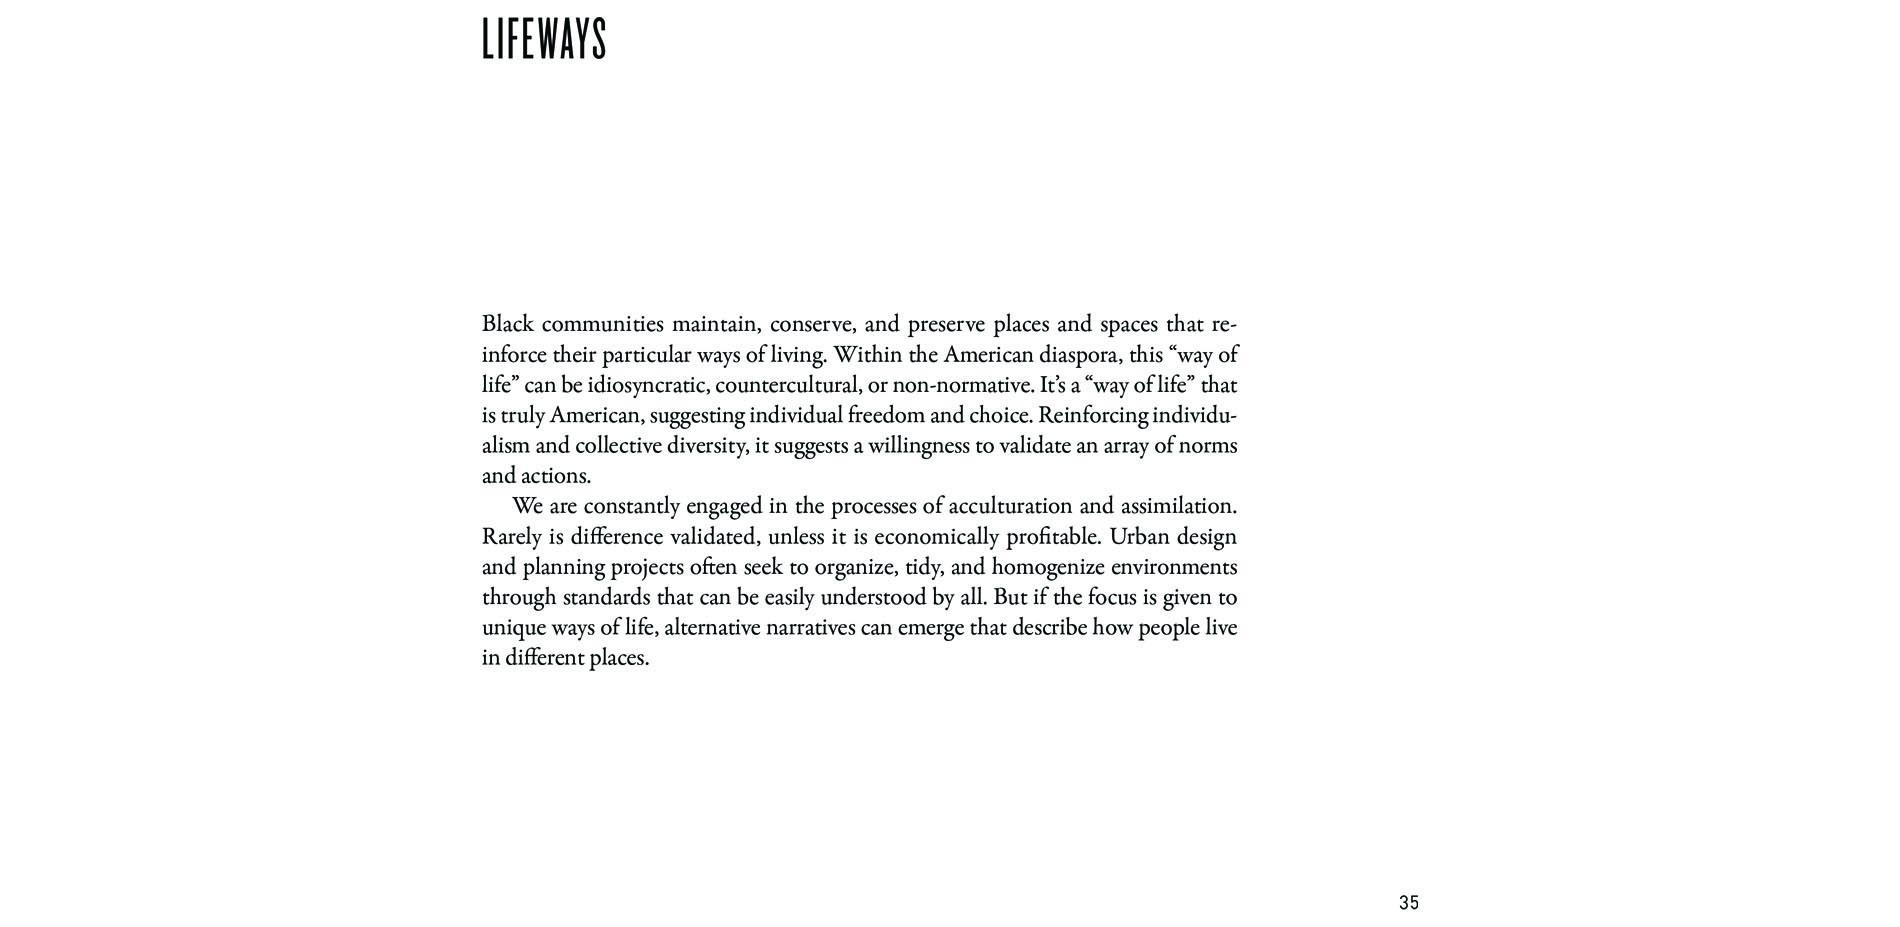 Black Landscapes Matter, Lifeways (pg. 35)